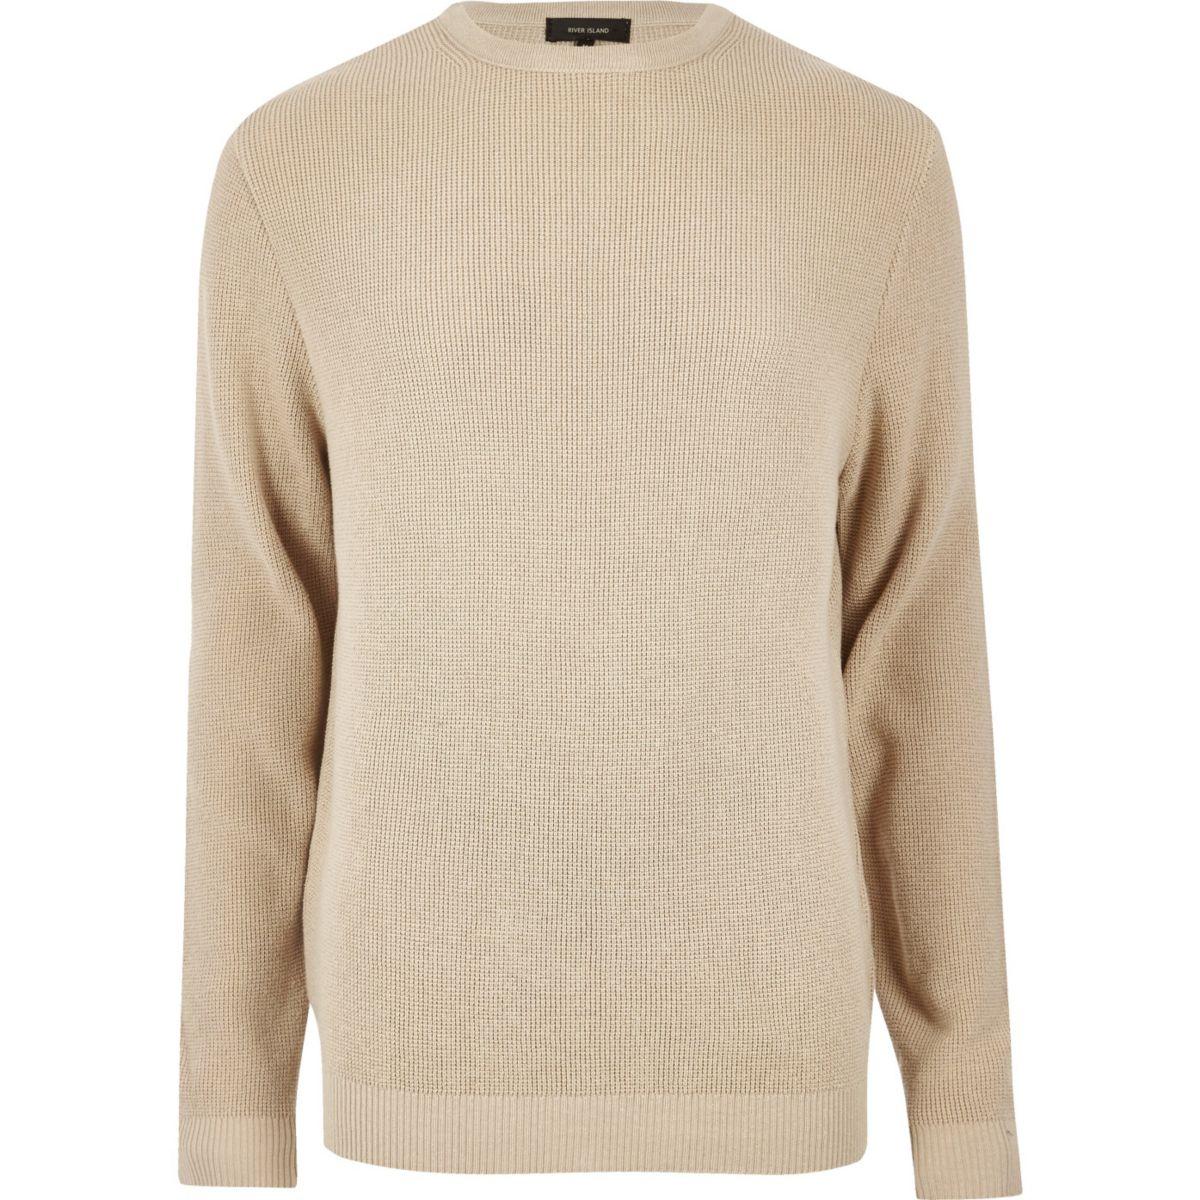 Camel textured sweater